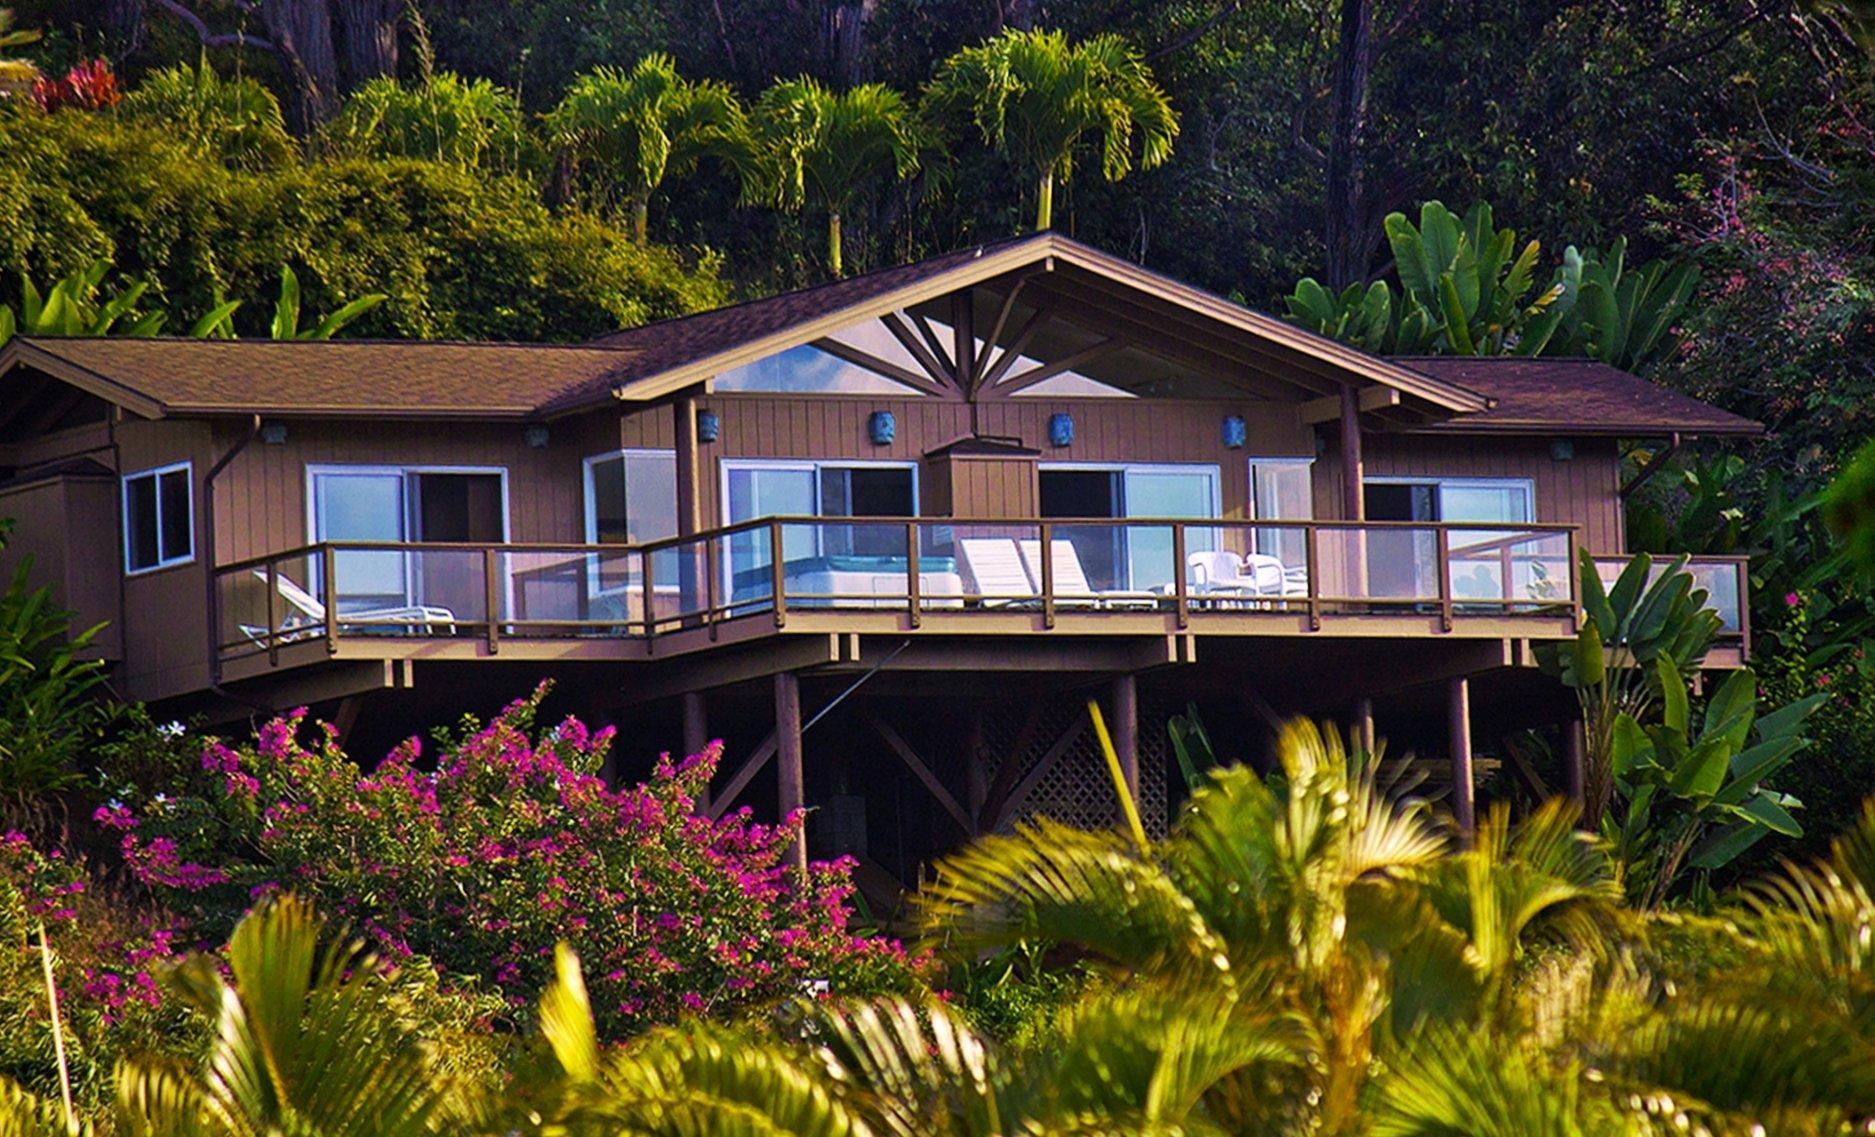 Maui Tradewinds